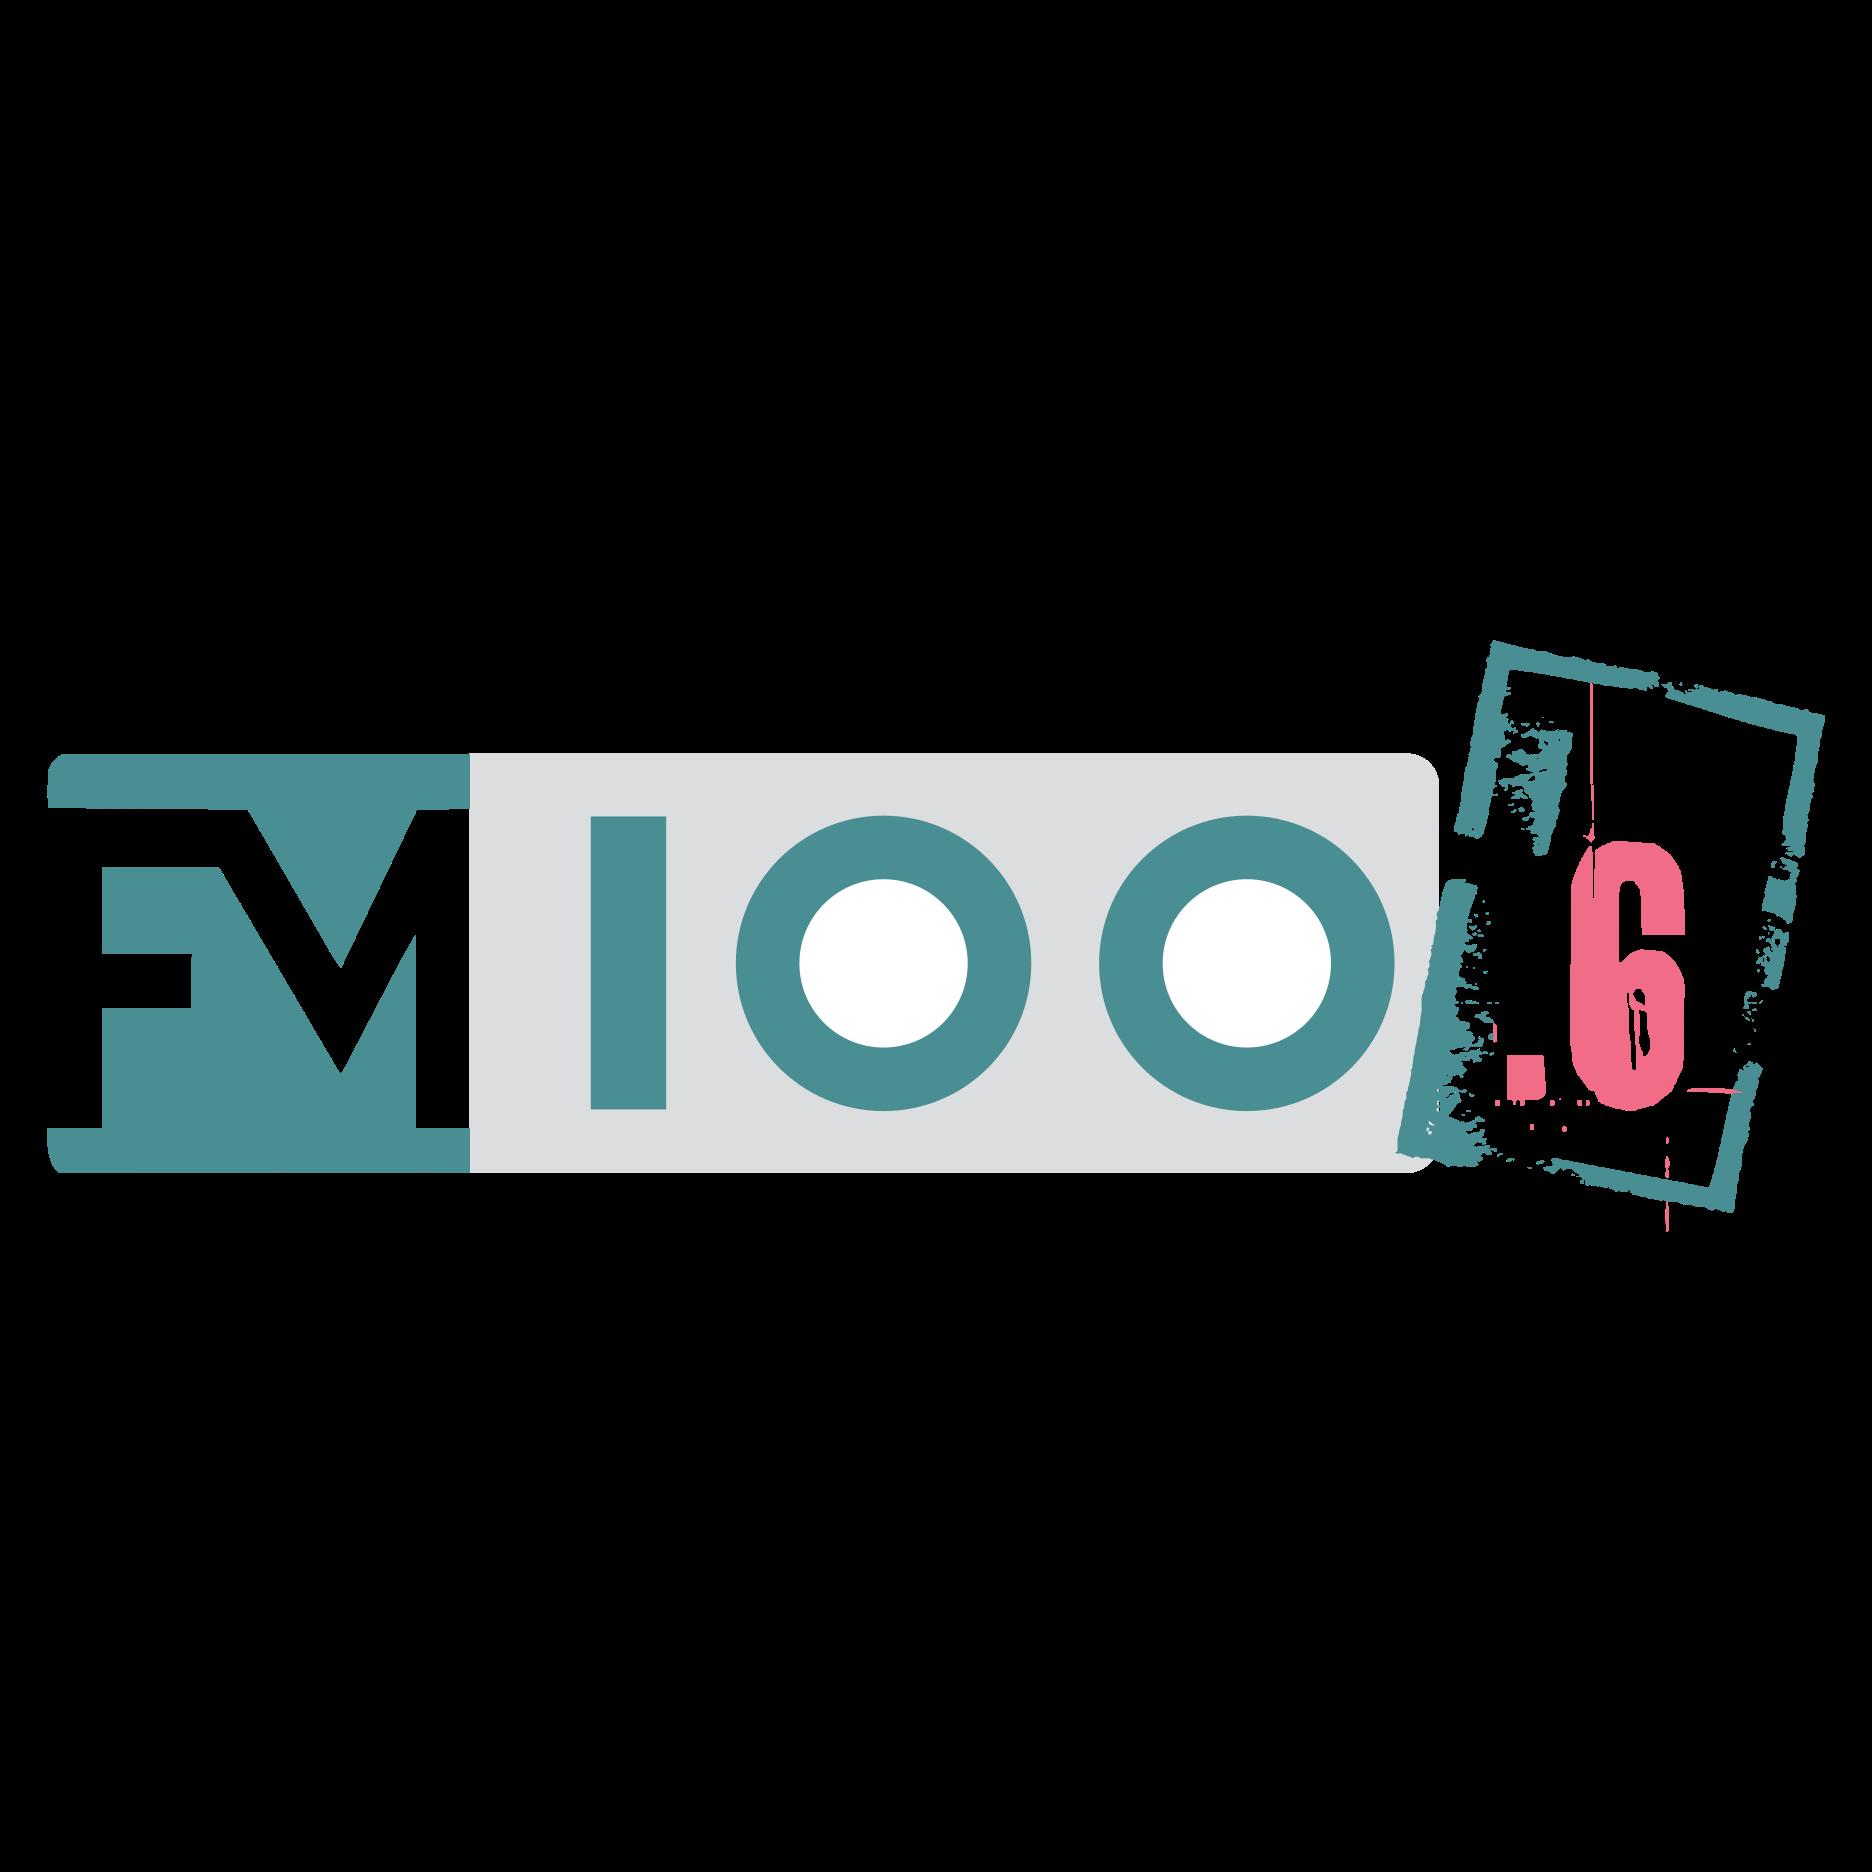 FM100.6 Thessaloniki